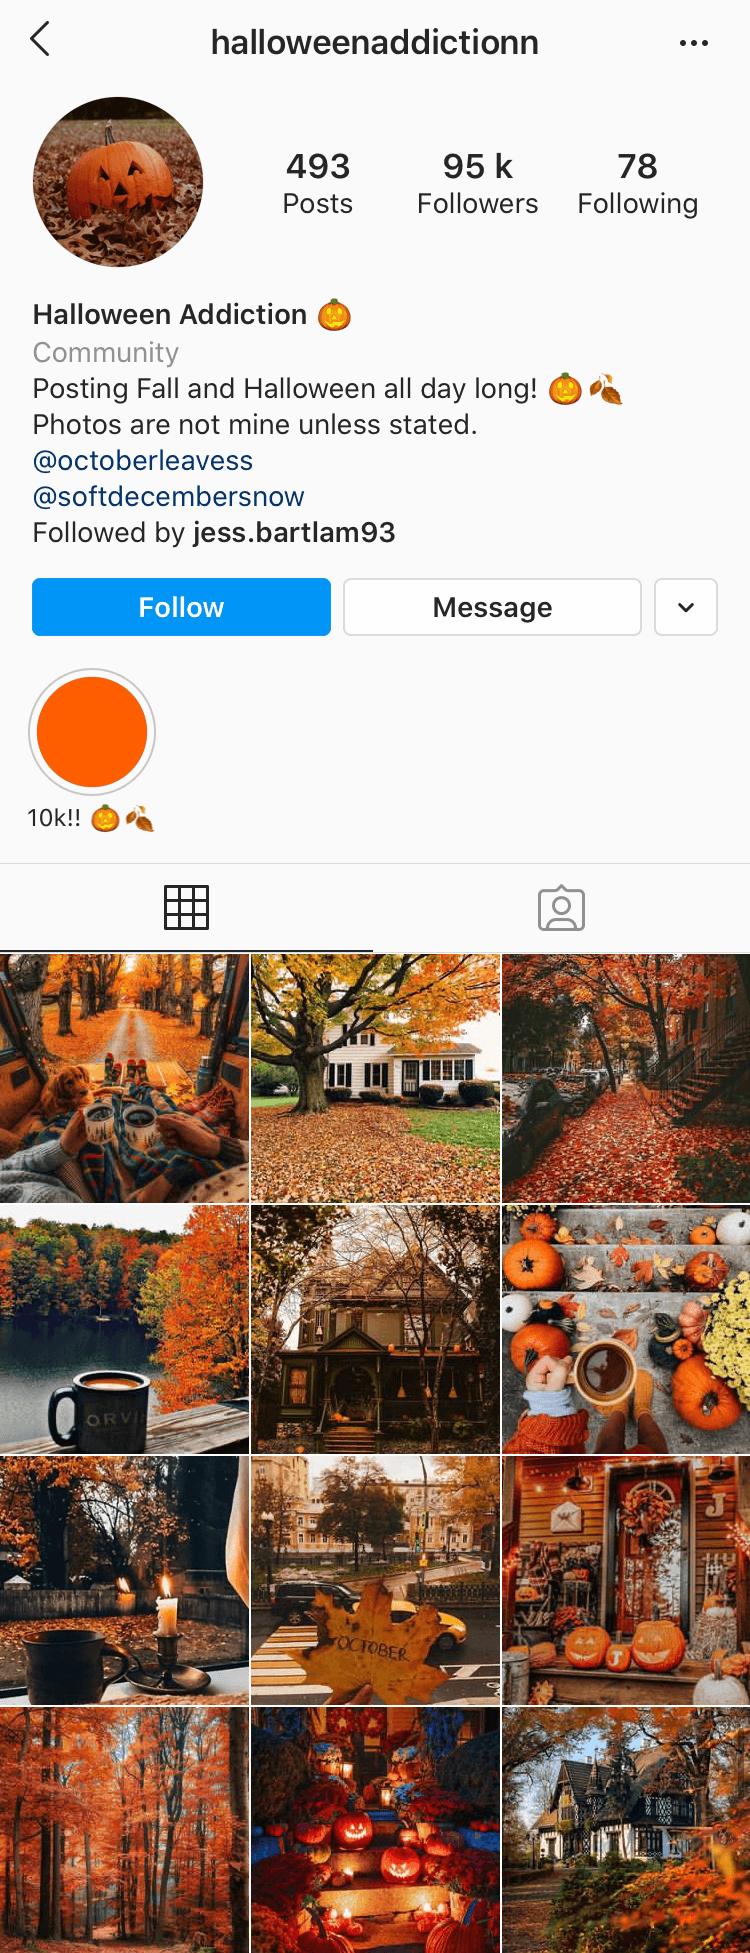 Instagram account @halloweenaddictionn